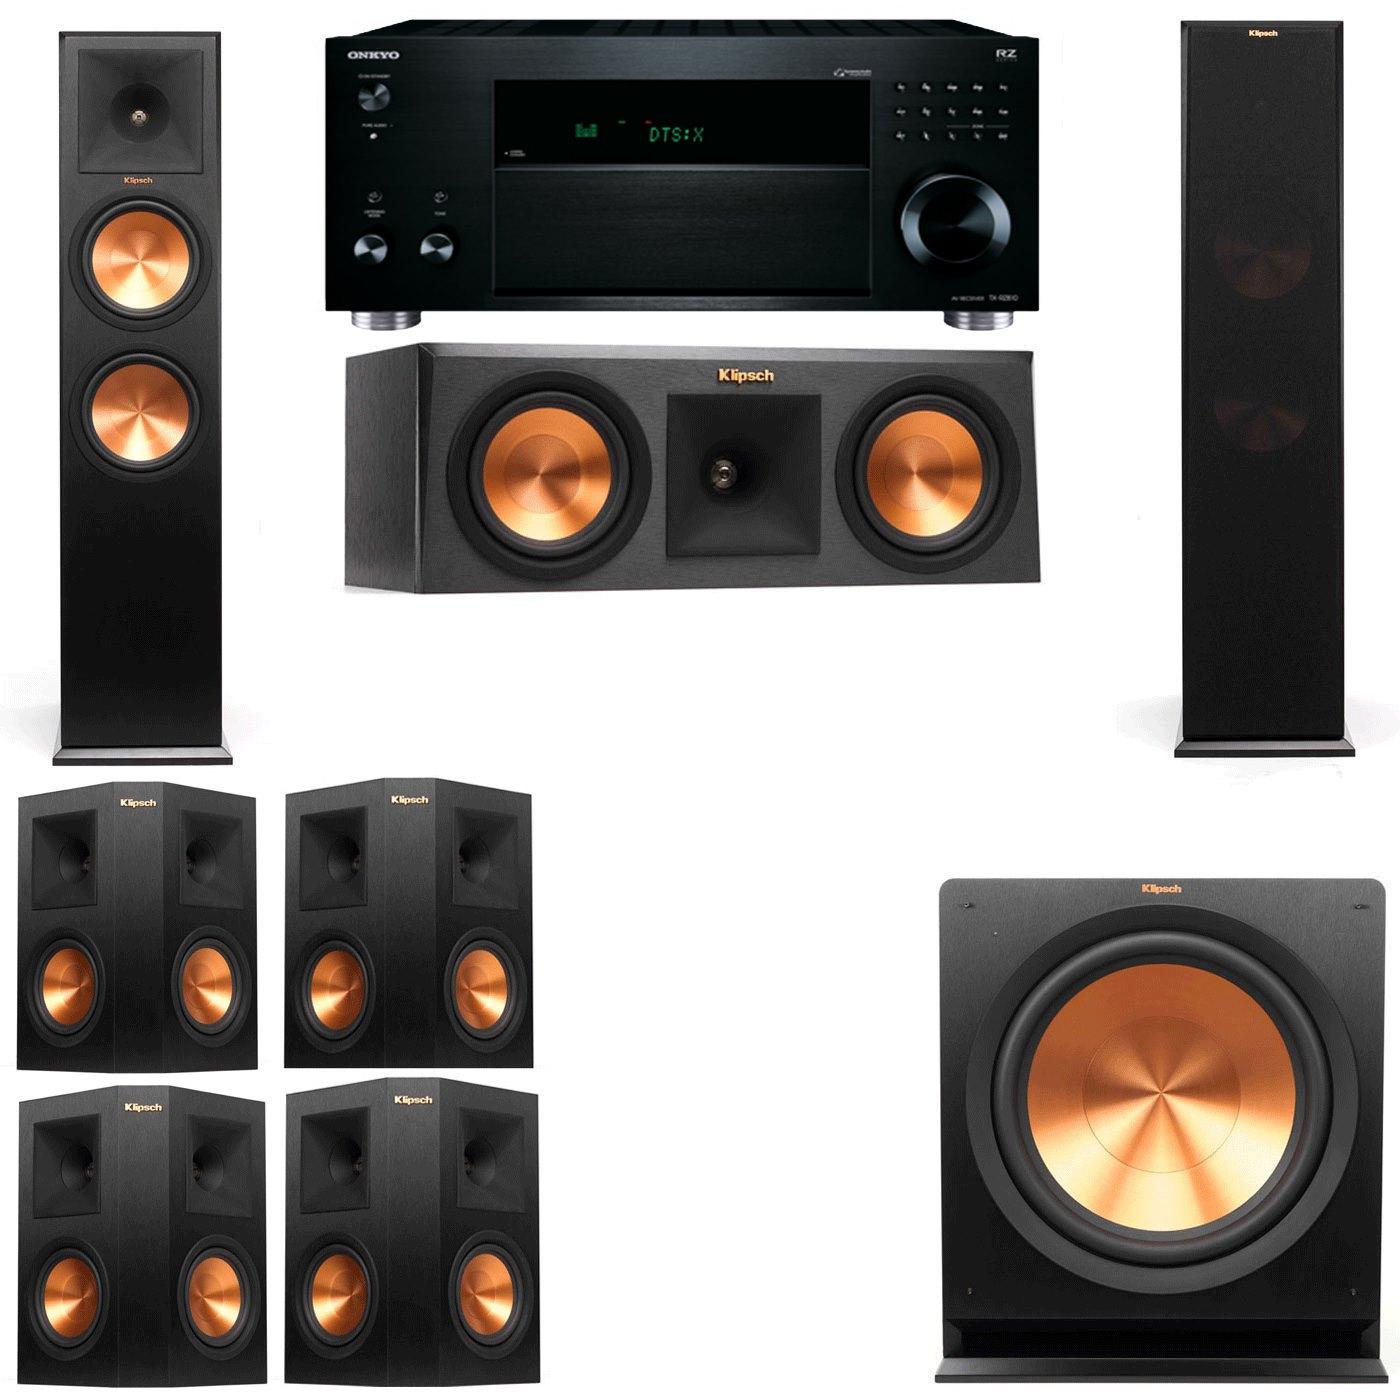 Klipsch RP-280F Tower Speakers-RP-250C-7.1-Onkyo TX-RZ810